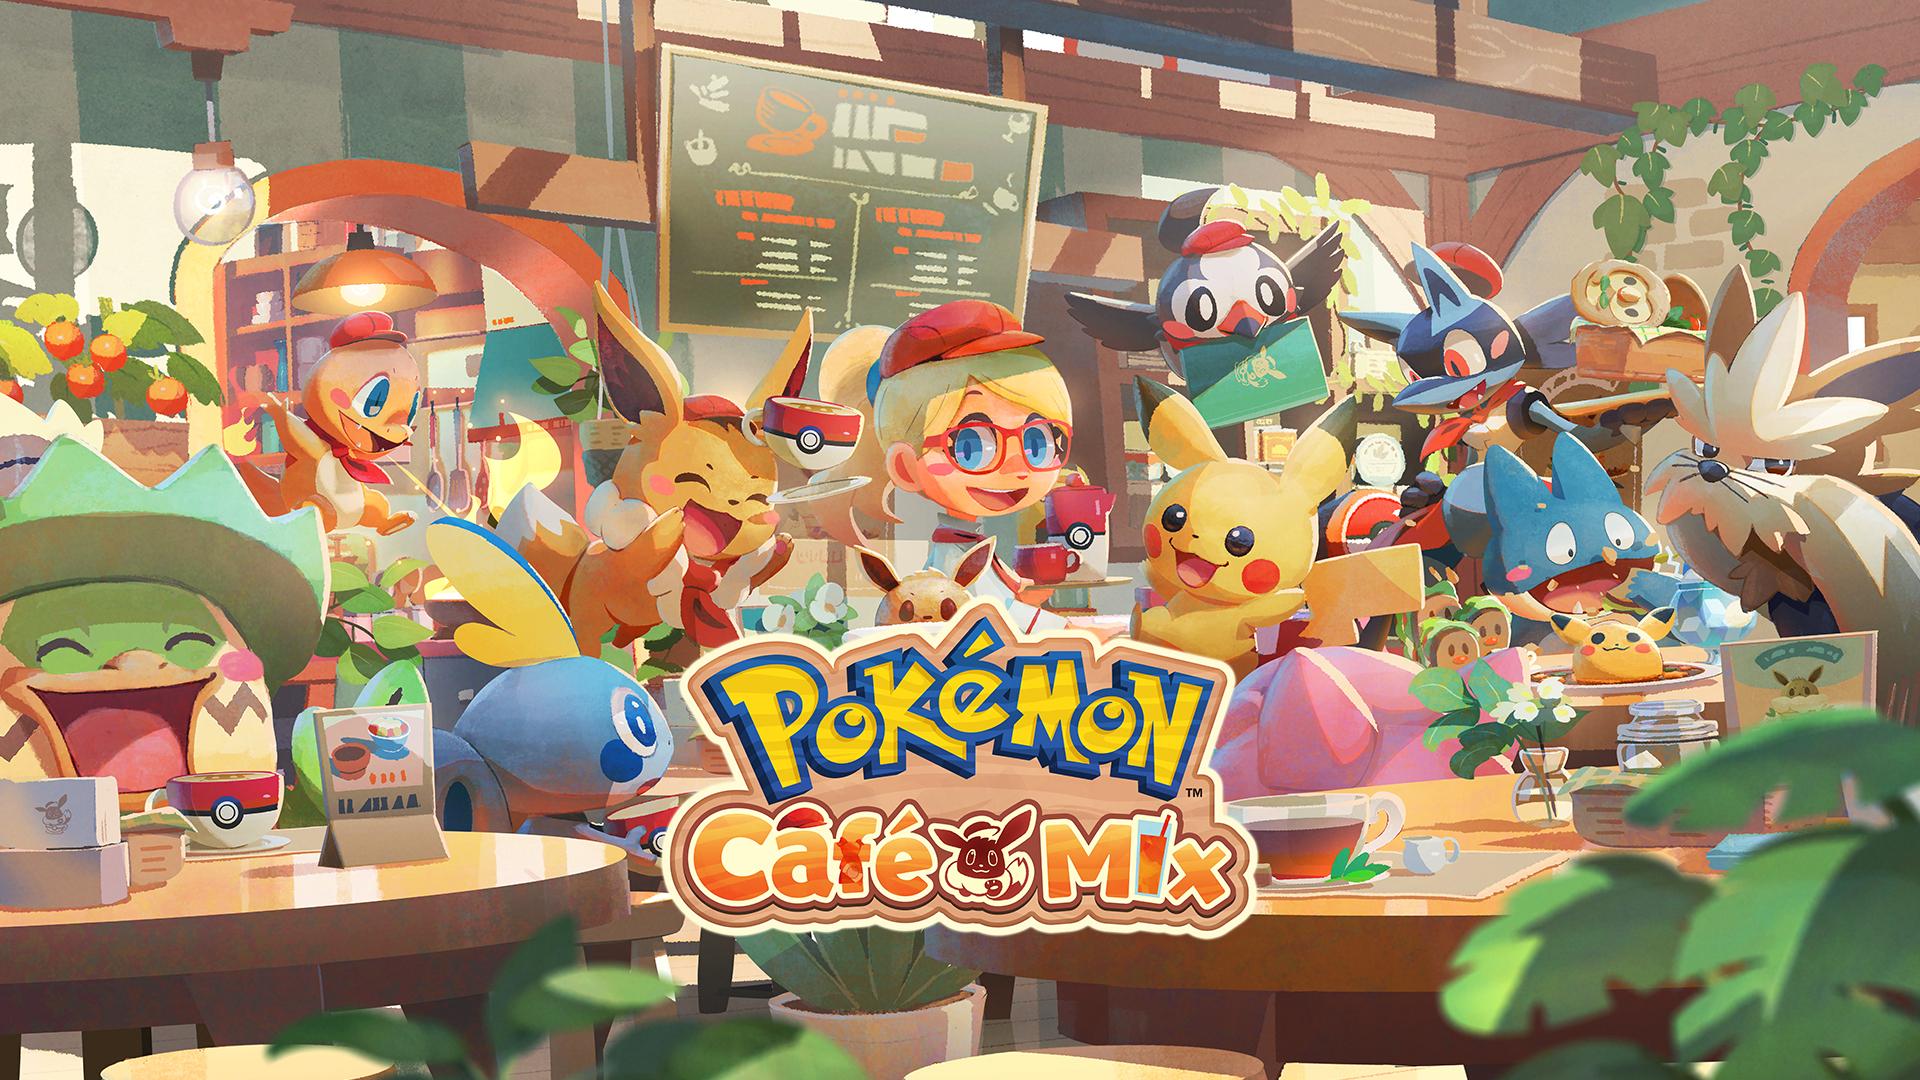 Nintendo: Pokémon Cafe Mix Free Download Nintendo Switch